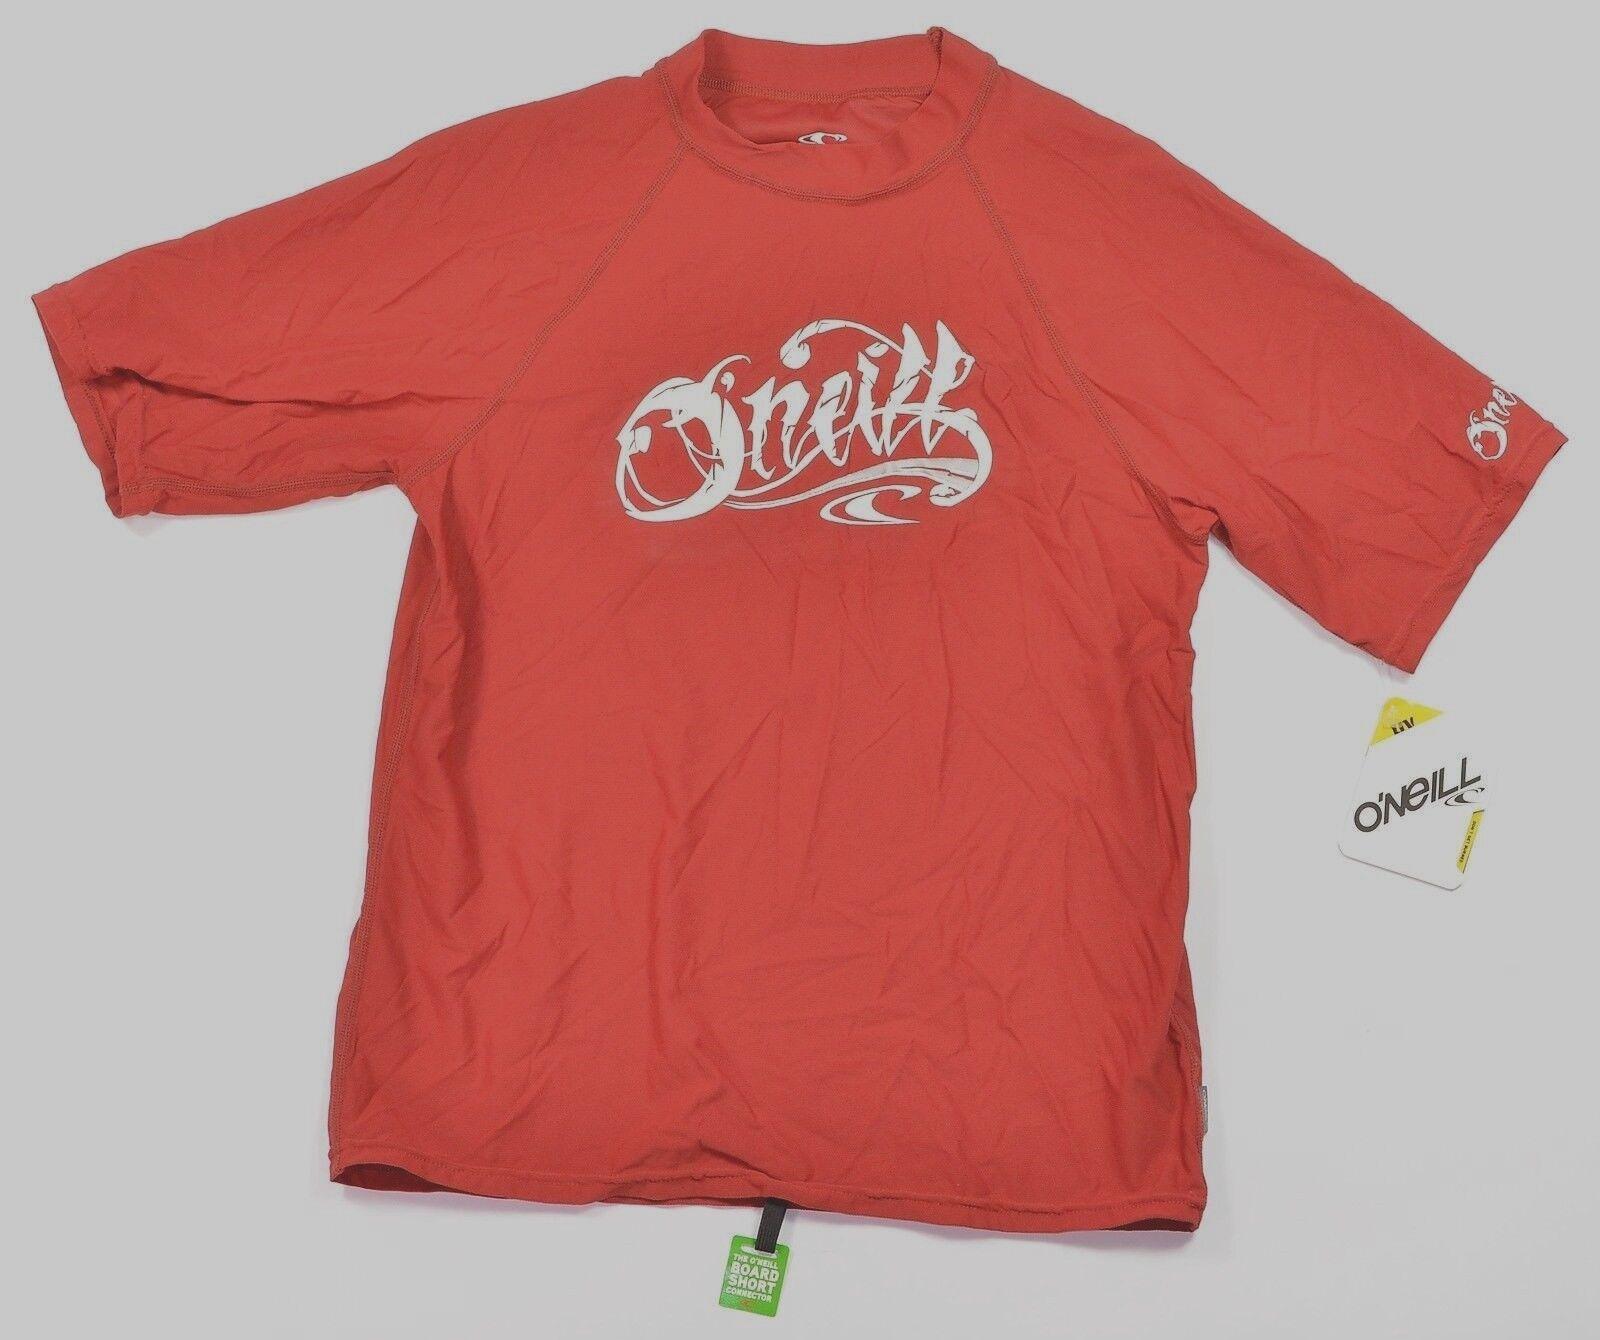 O'Neill Jeunes Style #2320 Jeunes O'Neill 24/7 Rond Manches Courtes Rashguard T-Shirt 12 Foncé 3d144c